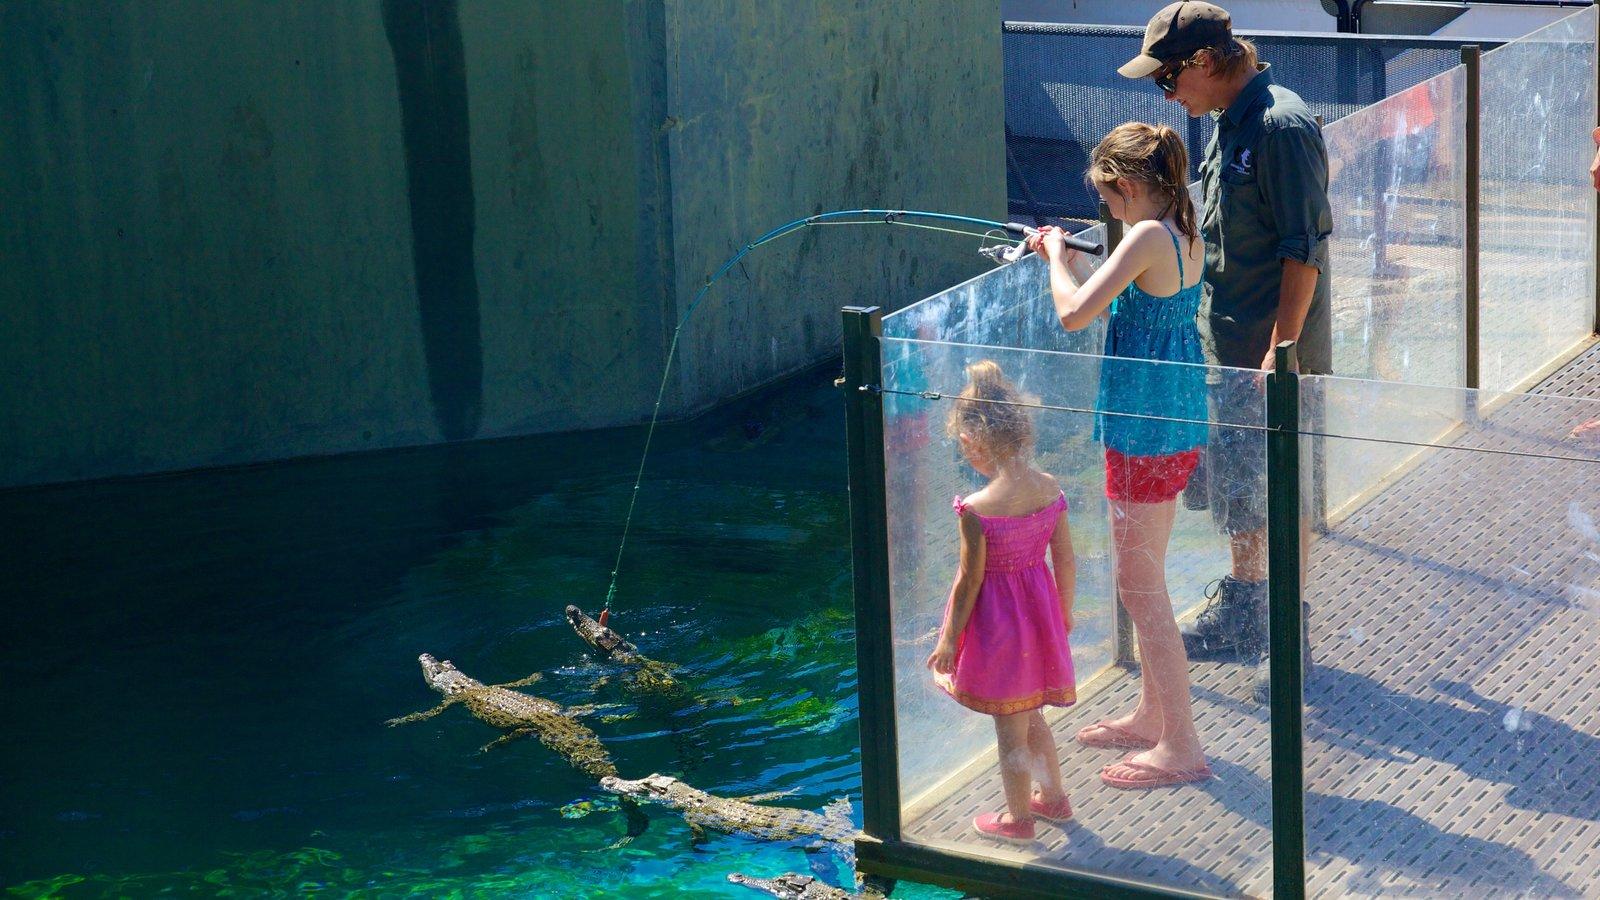 Crocosaurus Cove showing zoo animals, dangerous animals and fishing